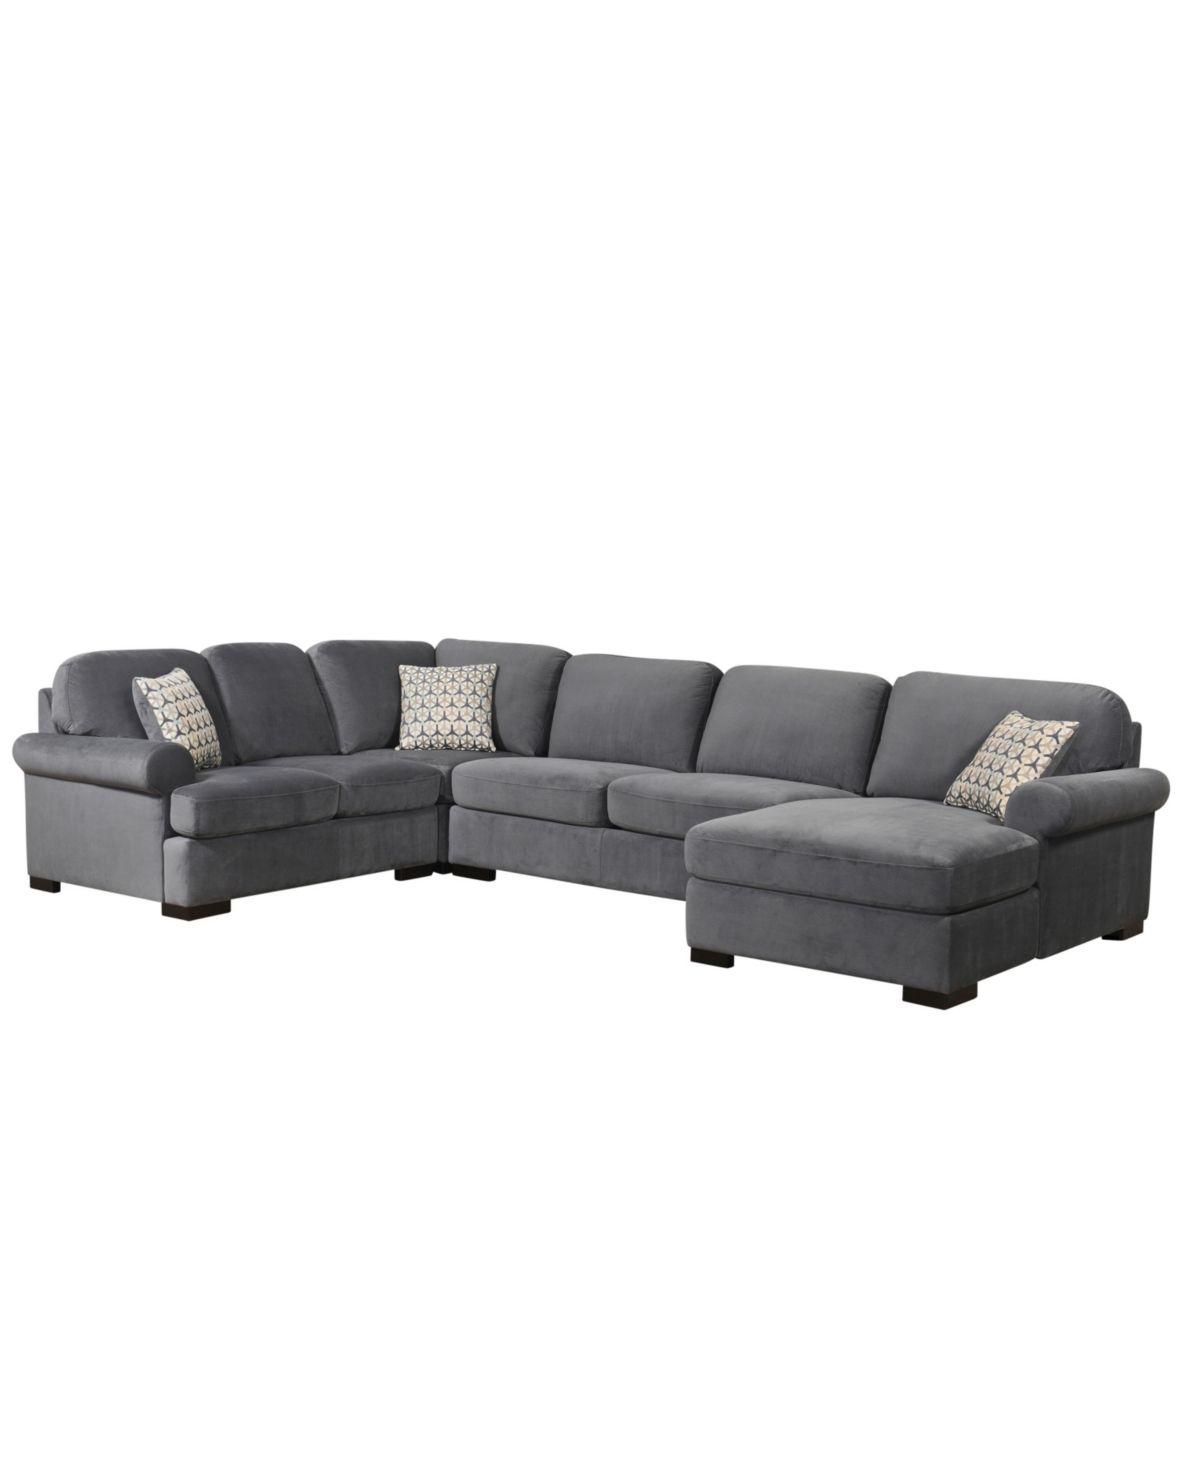 Lawrence 4 Pc Sectional Sofa Grey Sectional Sofa Furniture Sofa